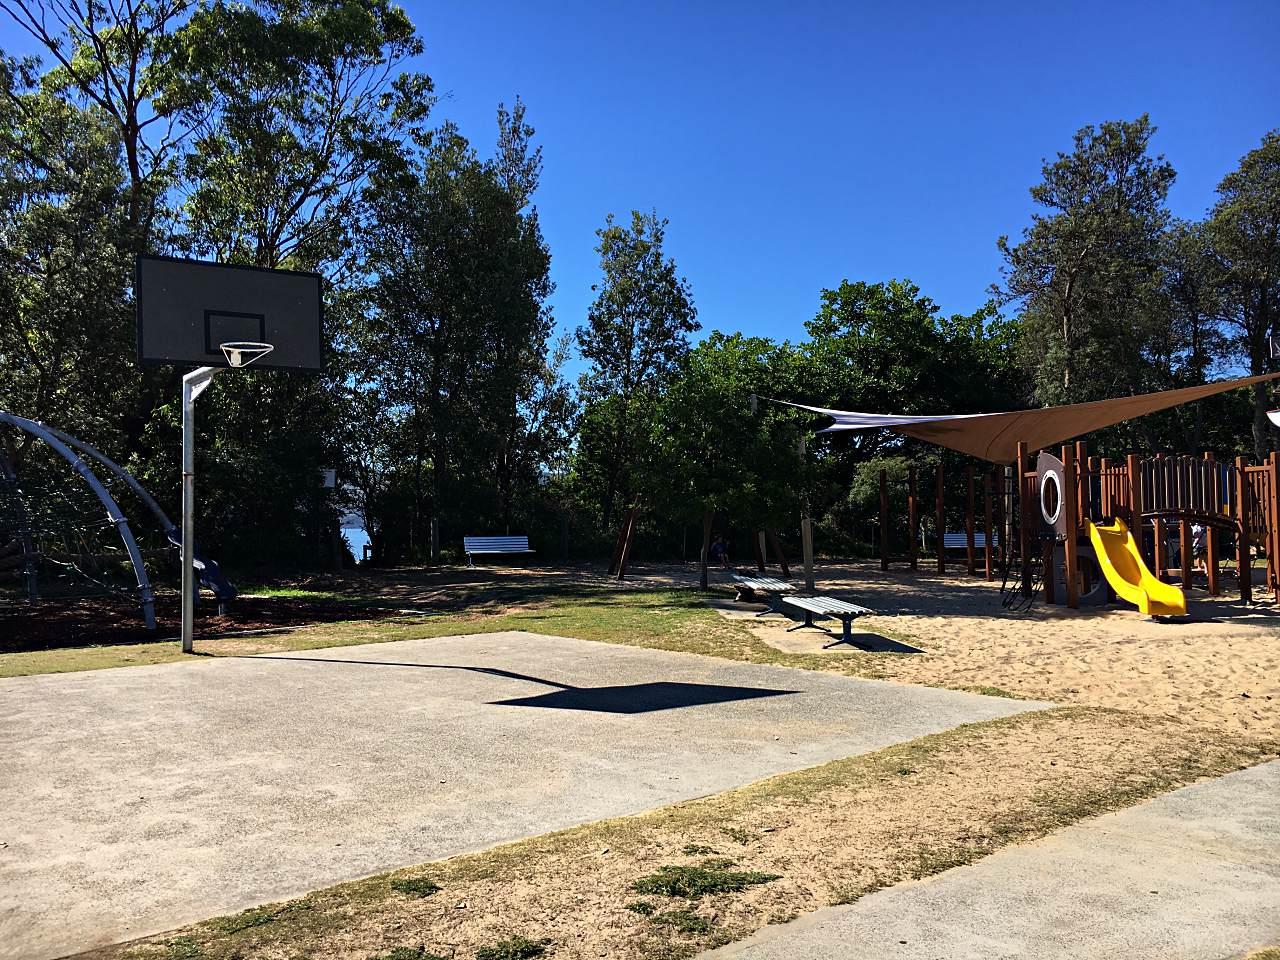 Basketball Hoop at Patonga Camping Ground Playground